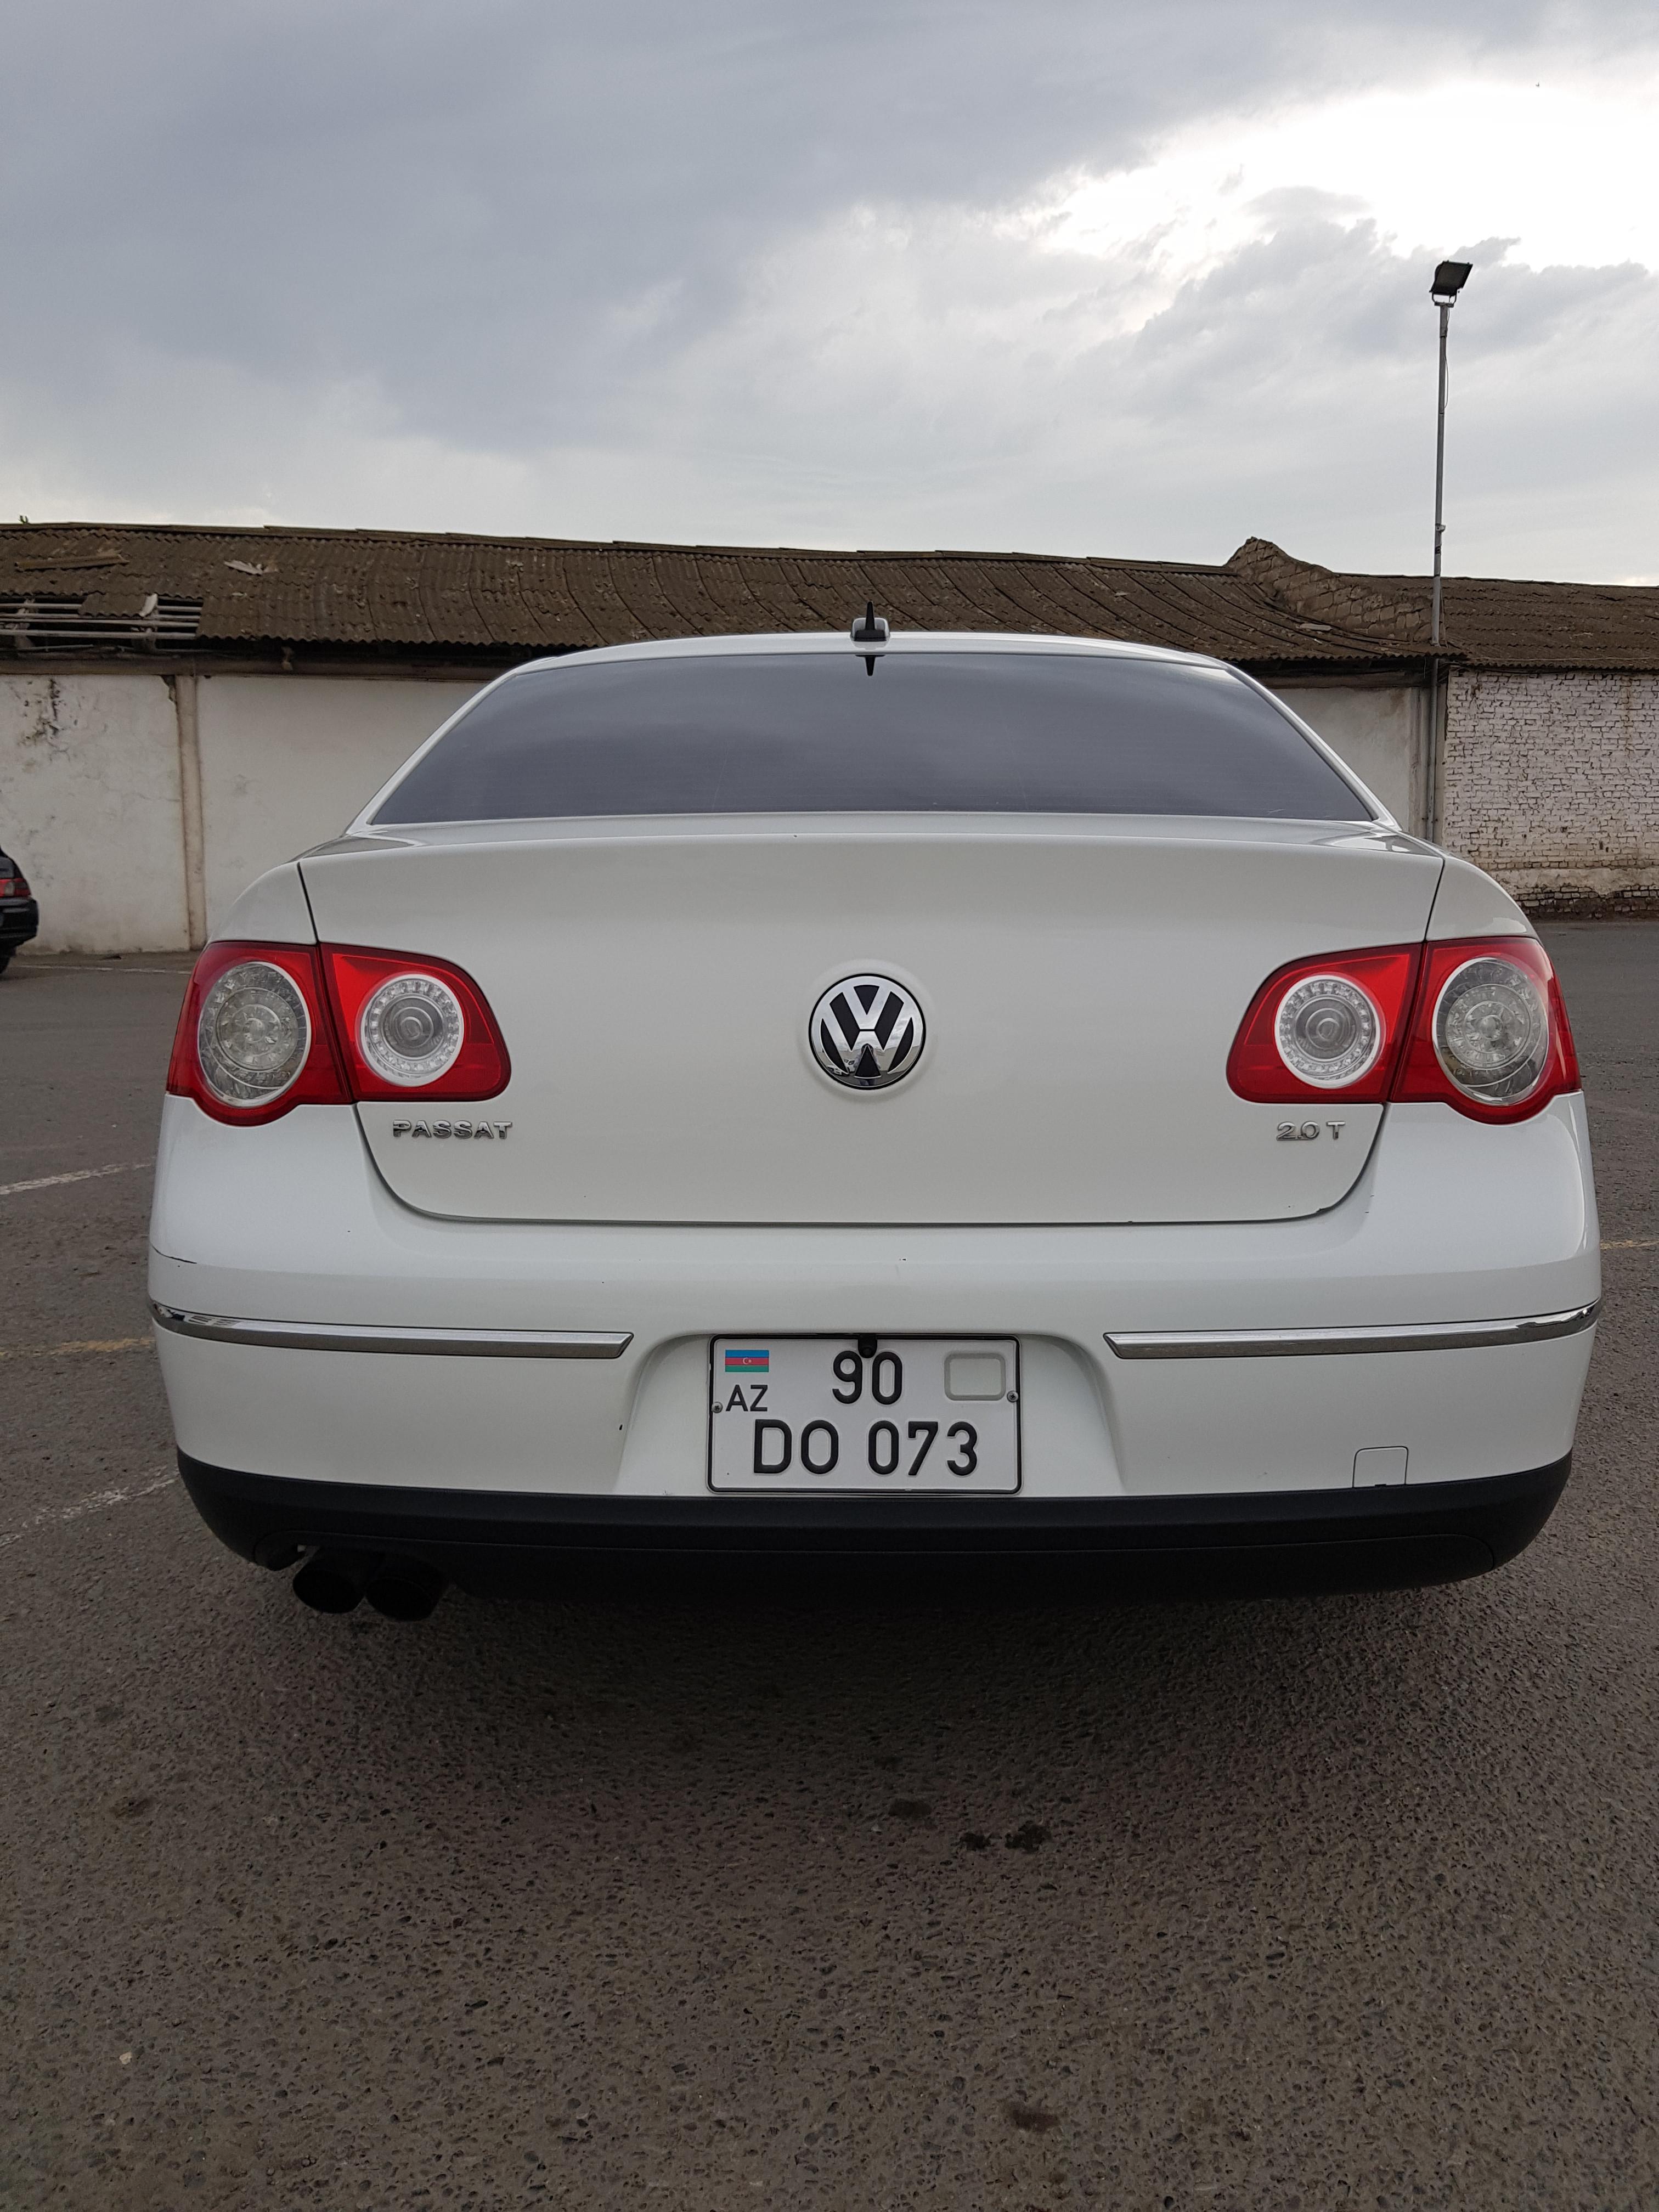 Volkswagen Passat 2.0(lt) 2005 Подержанный  $11000